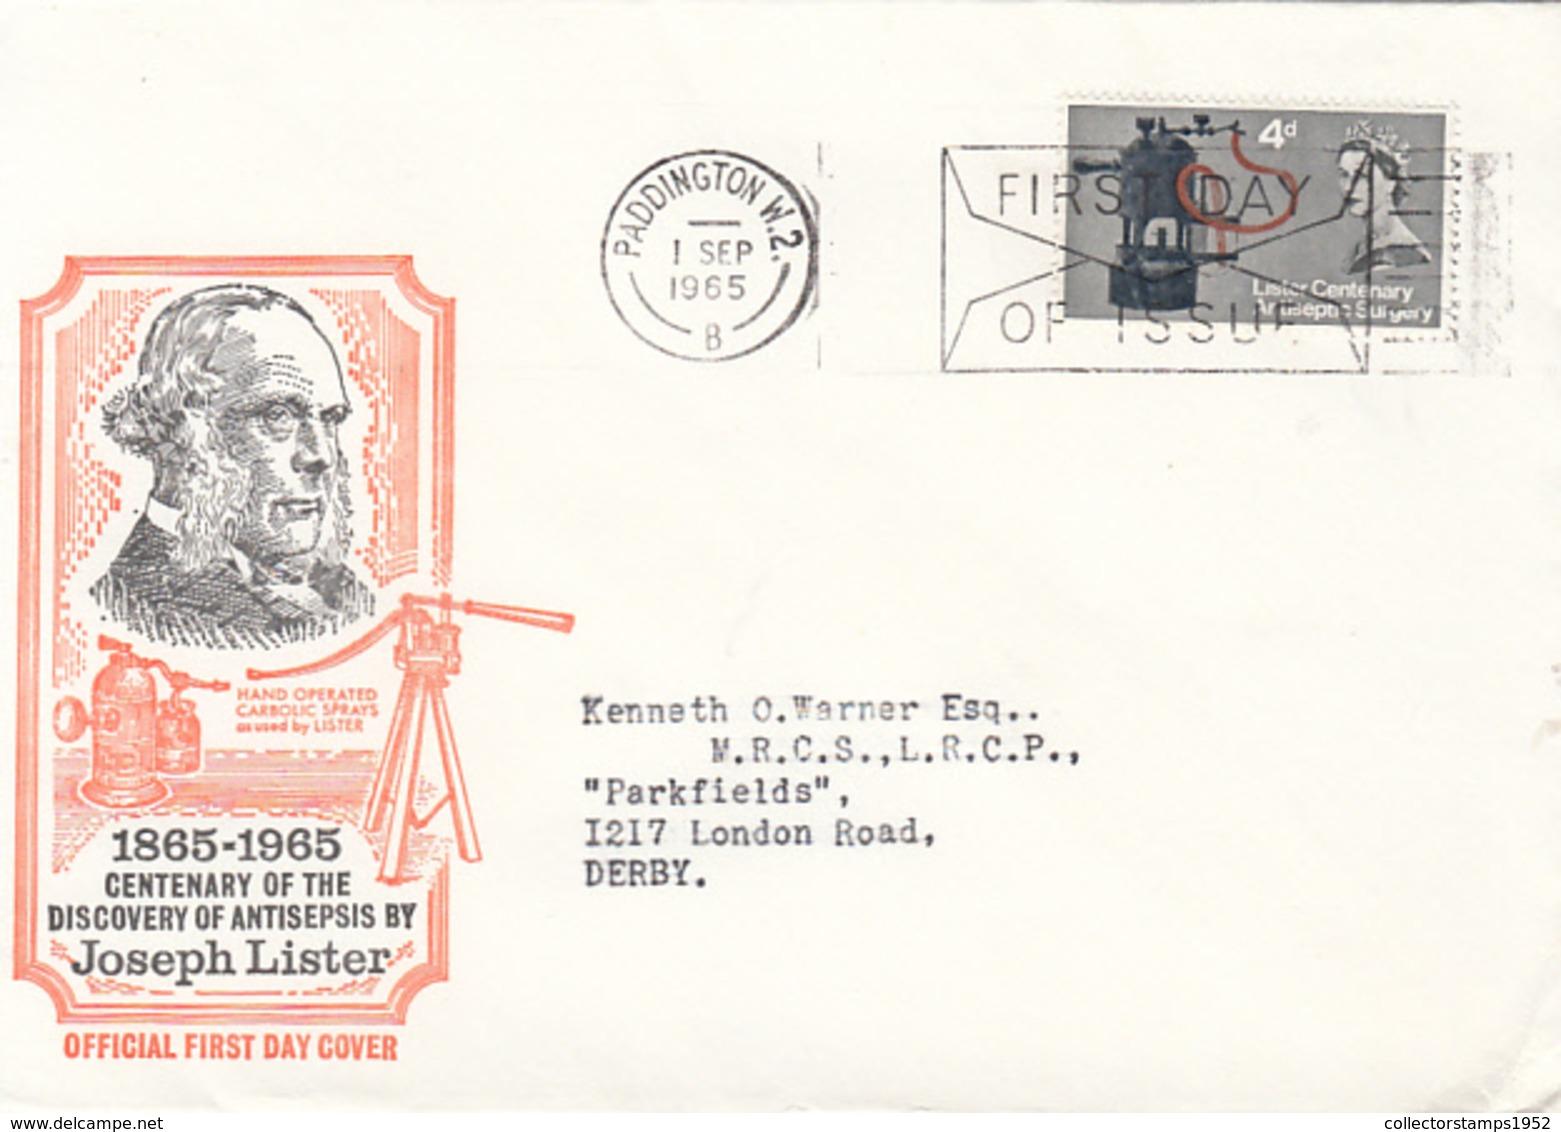 83543- JOSEPH LISTER, DISCOVERY OF ANTISEPSIS, MEDICINE, HEALTH, COVER FDC, 1965, UK - Medicina